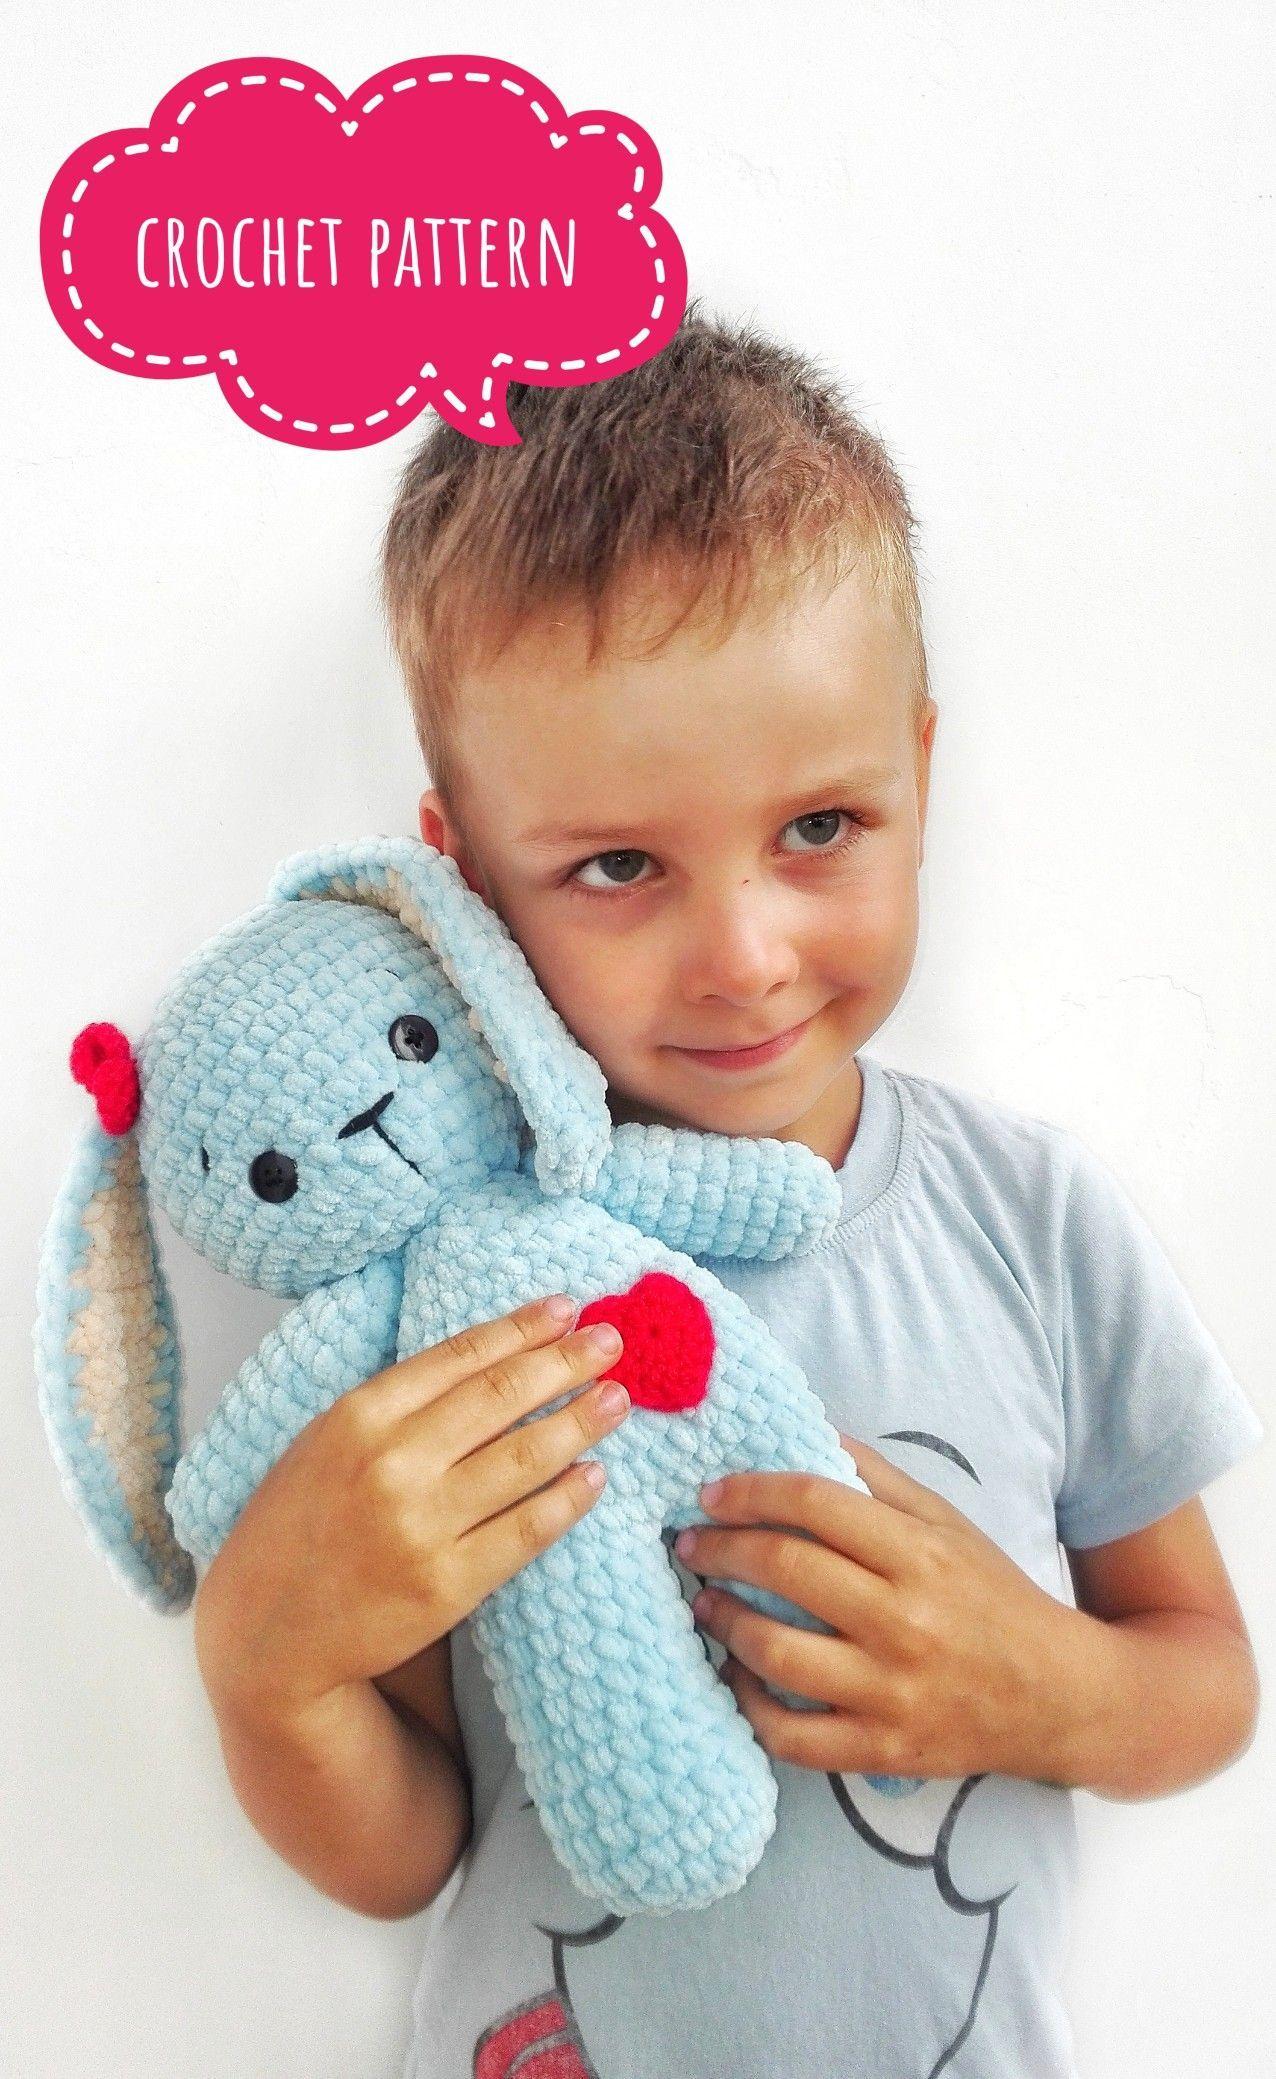 Crochet Pattern Bunny Toy